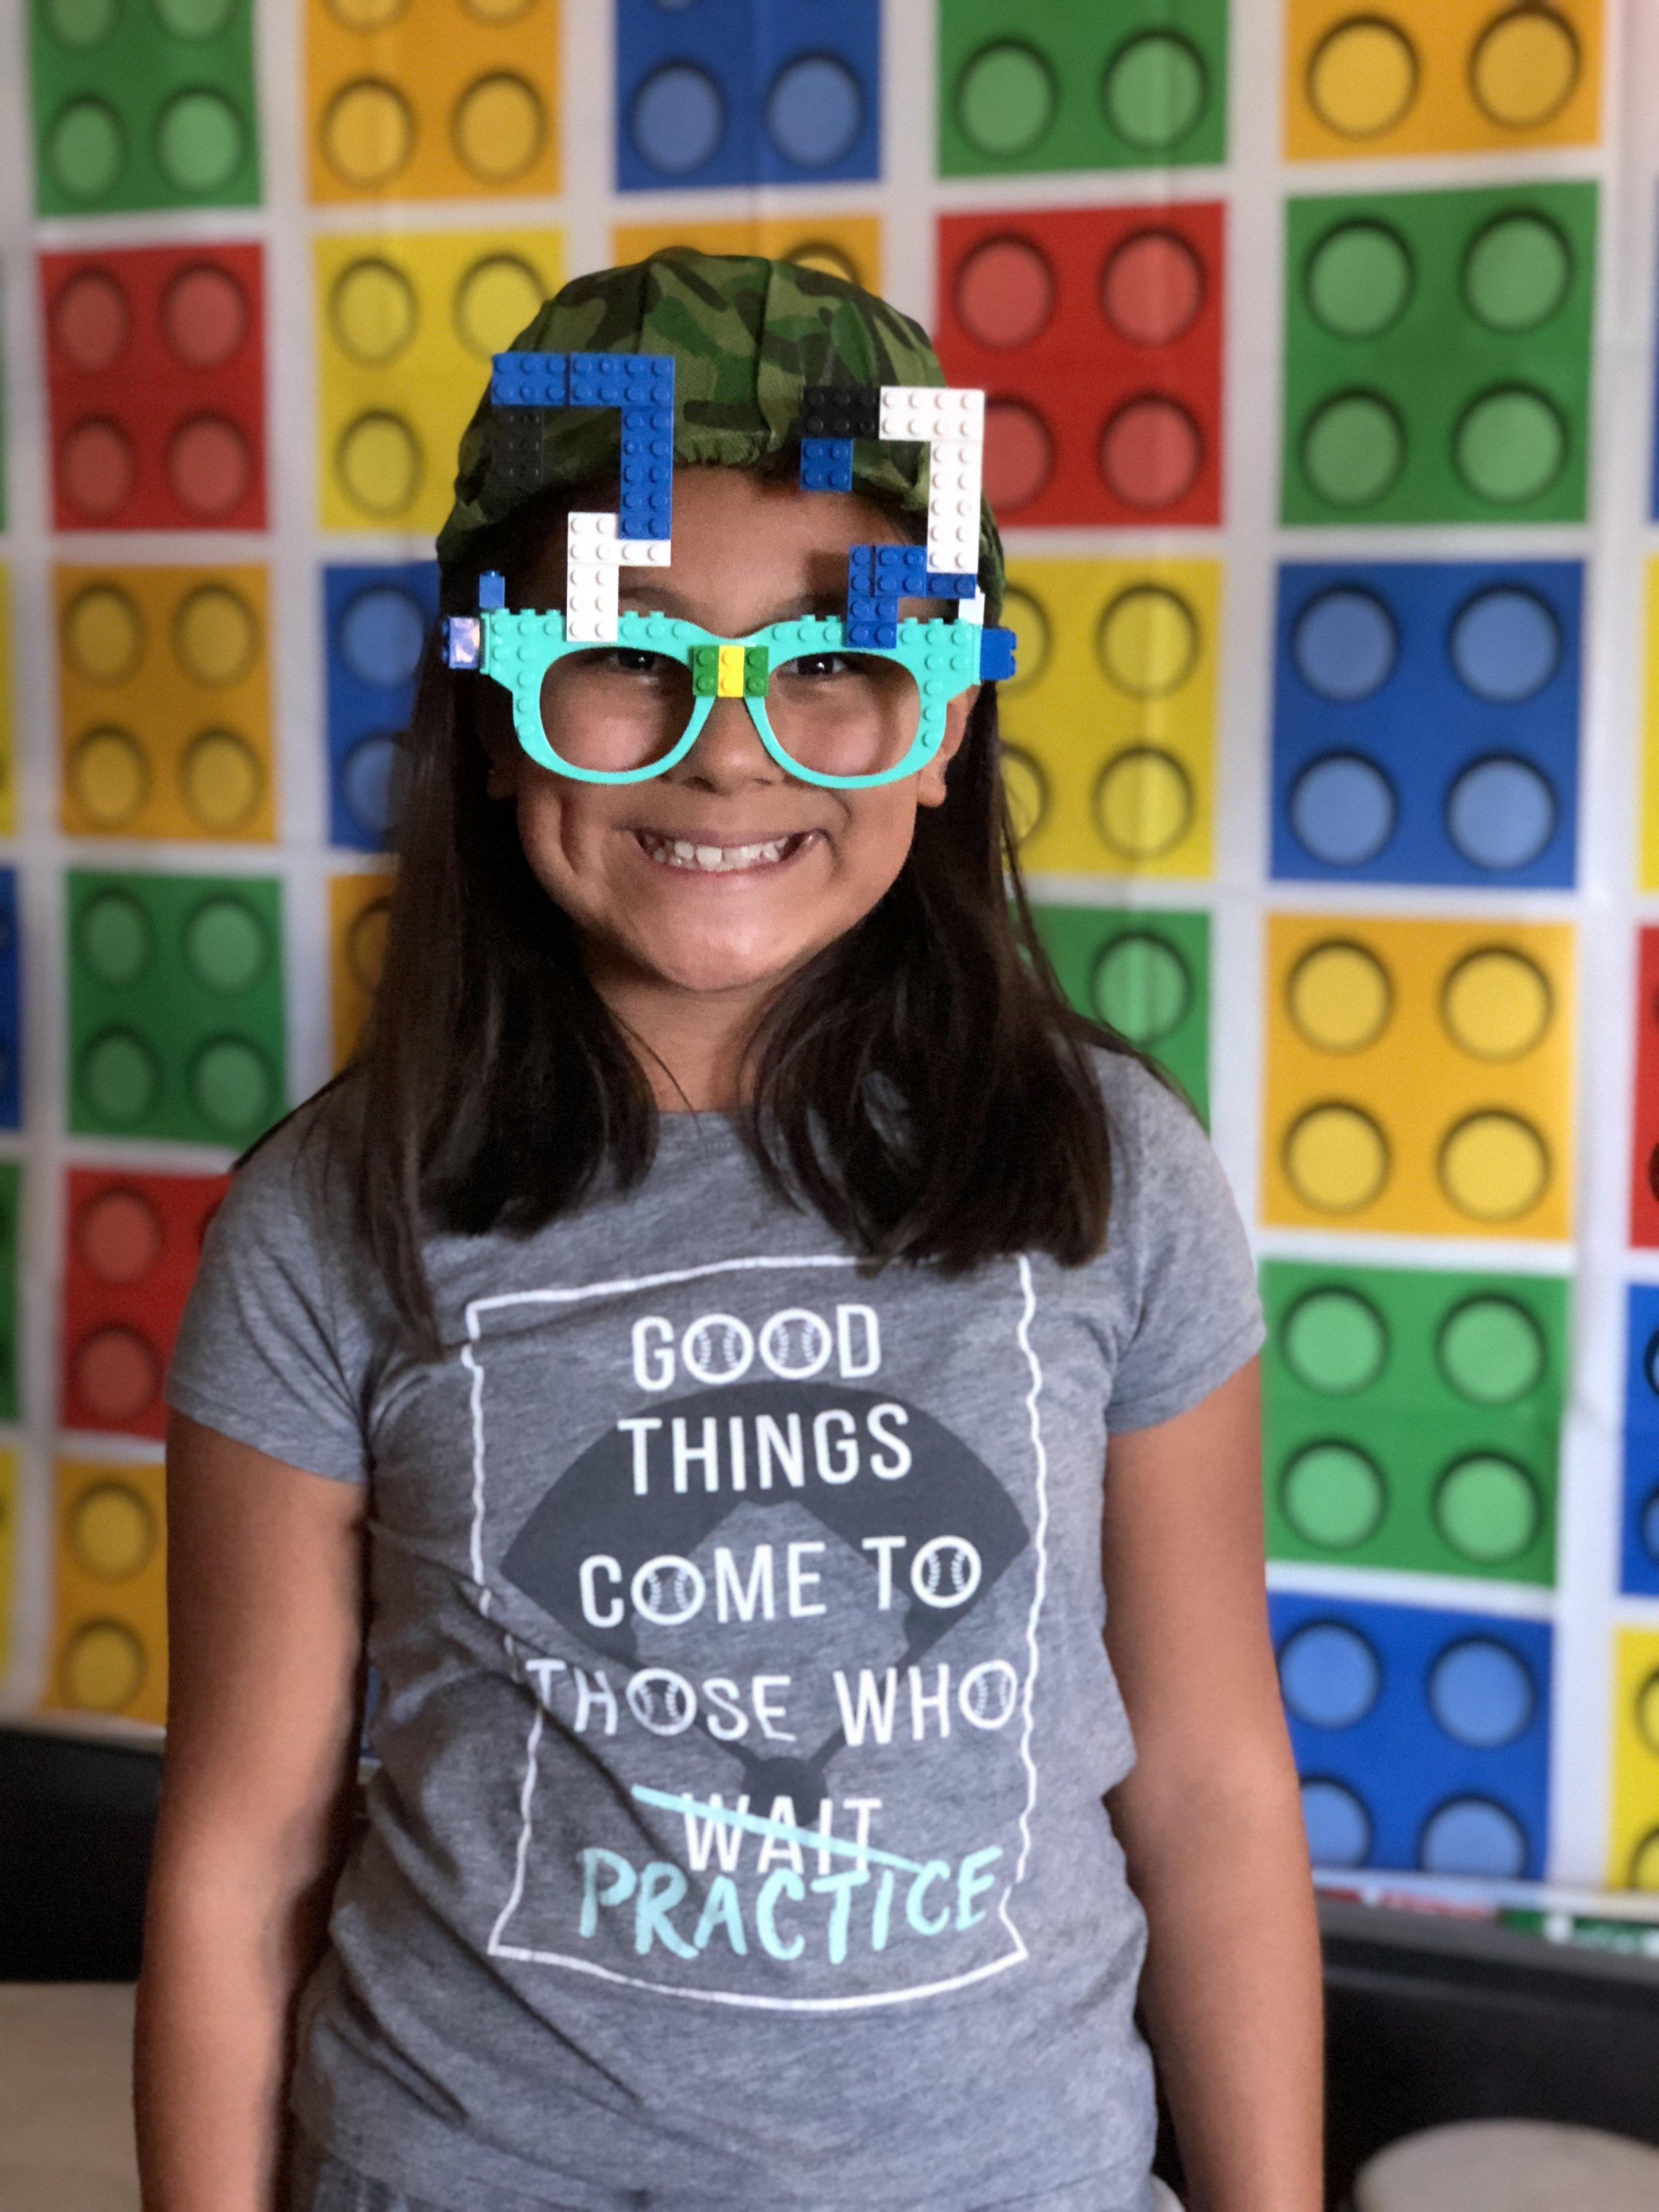 Lego Glasses Link  Here